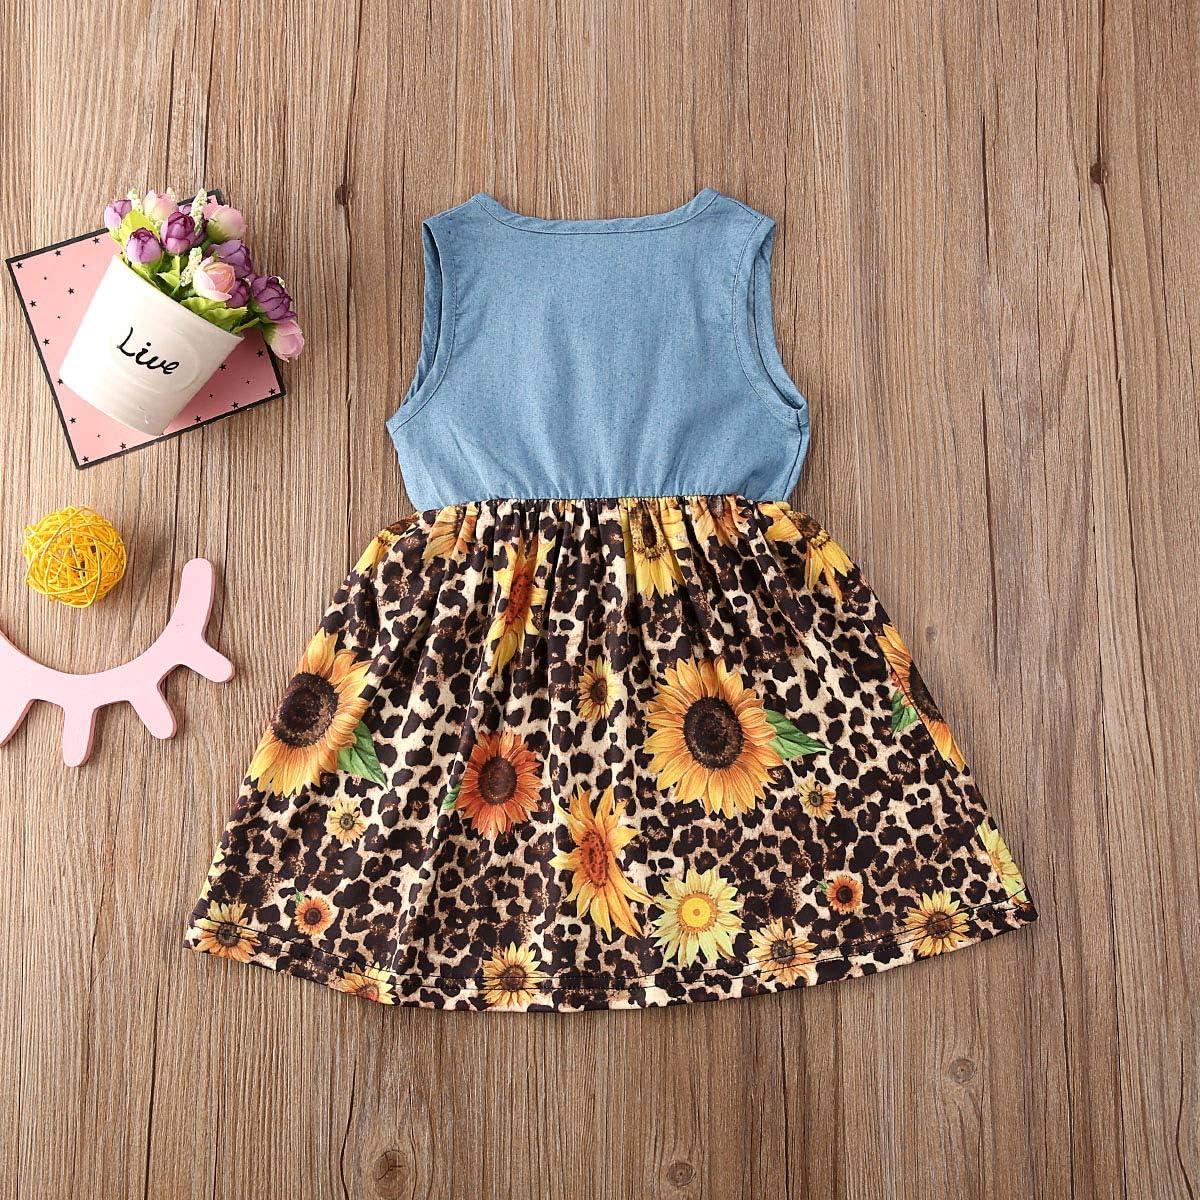 ICECTR Toddler Baby Girls Sunsuit Sleeveless Ruffled Denim Vest Tops Sunflower Print Tutu Dress Princess Summer Outfits